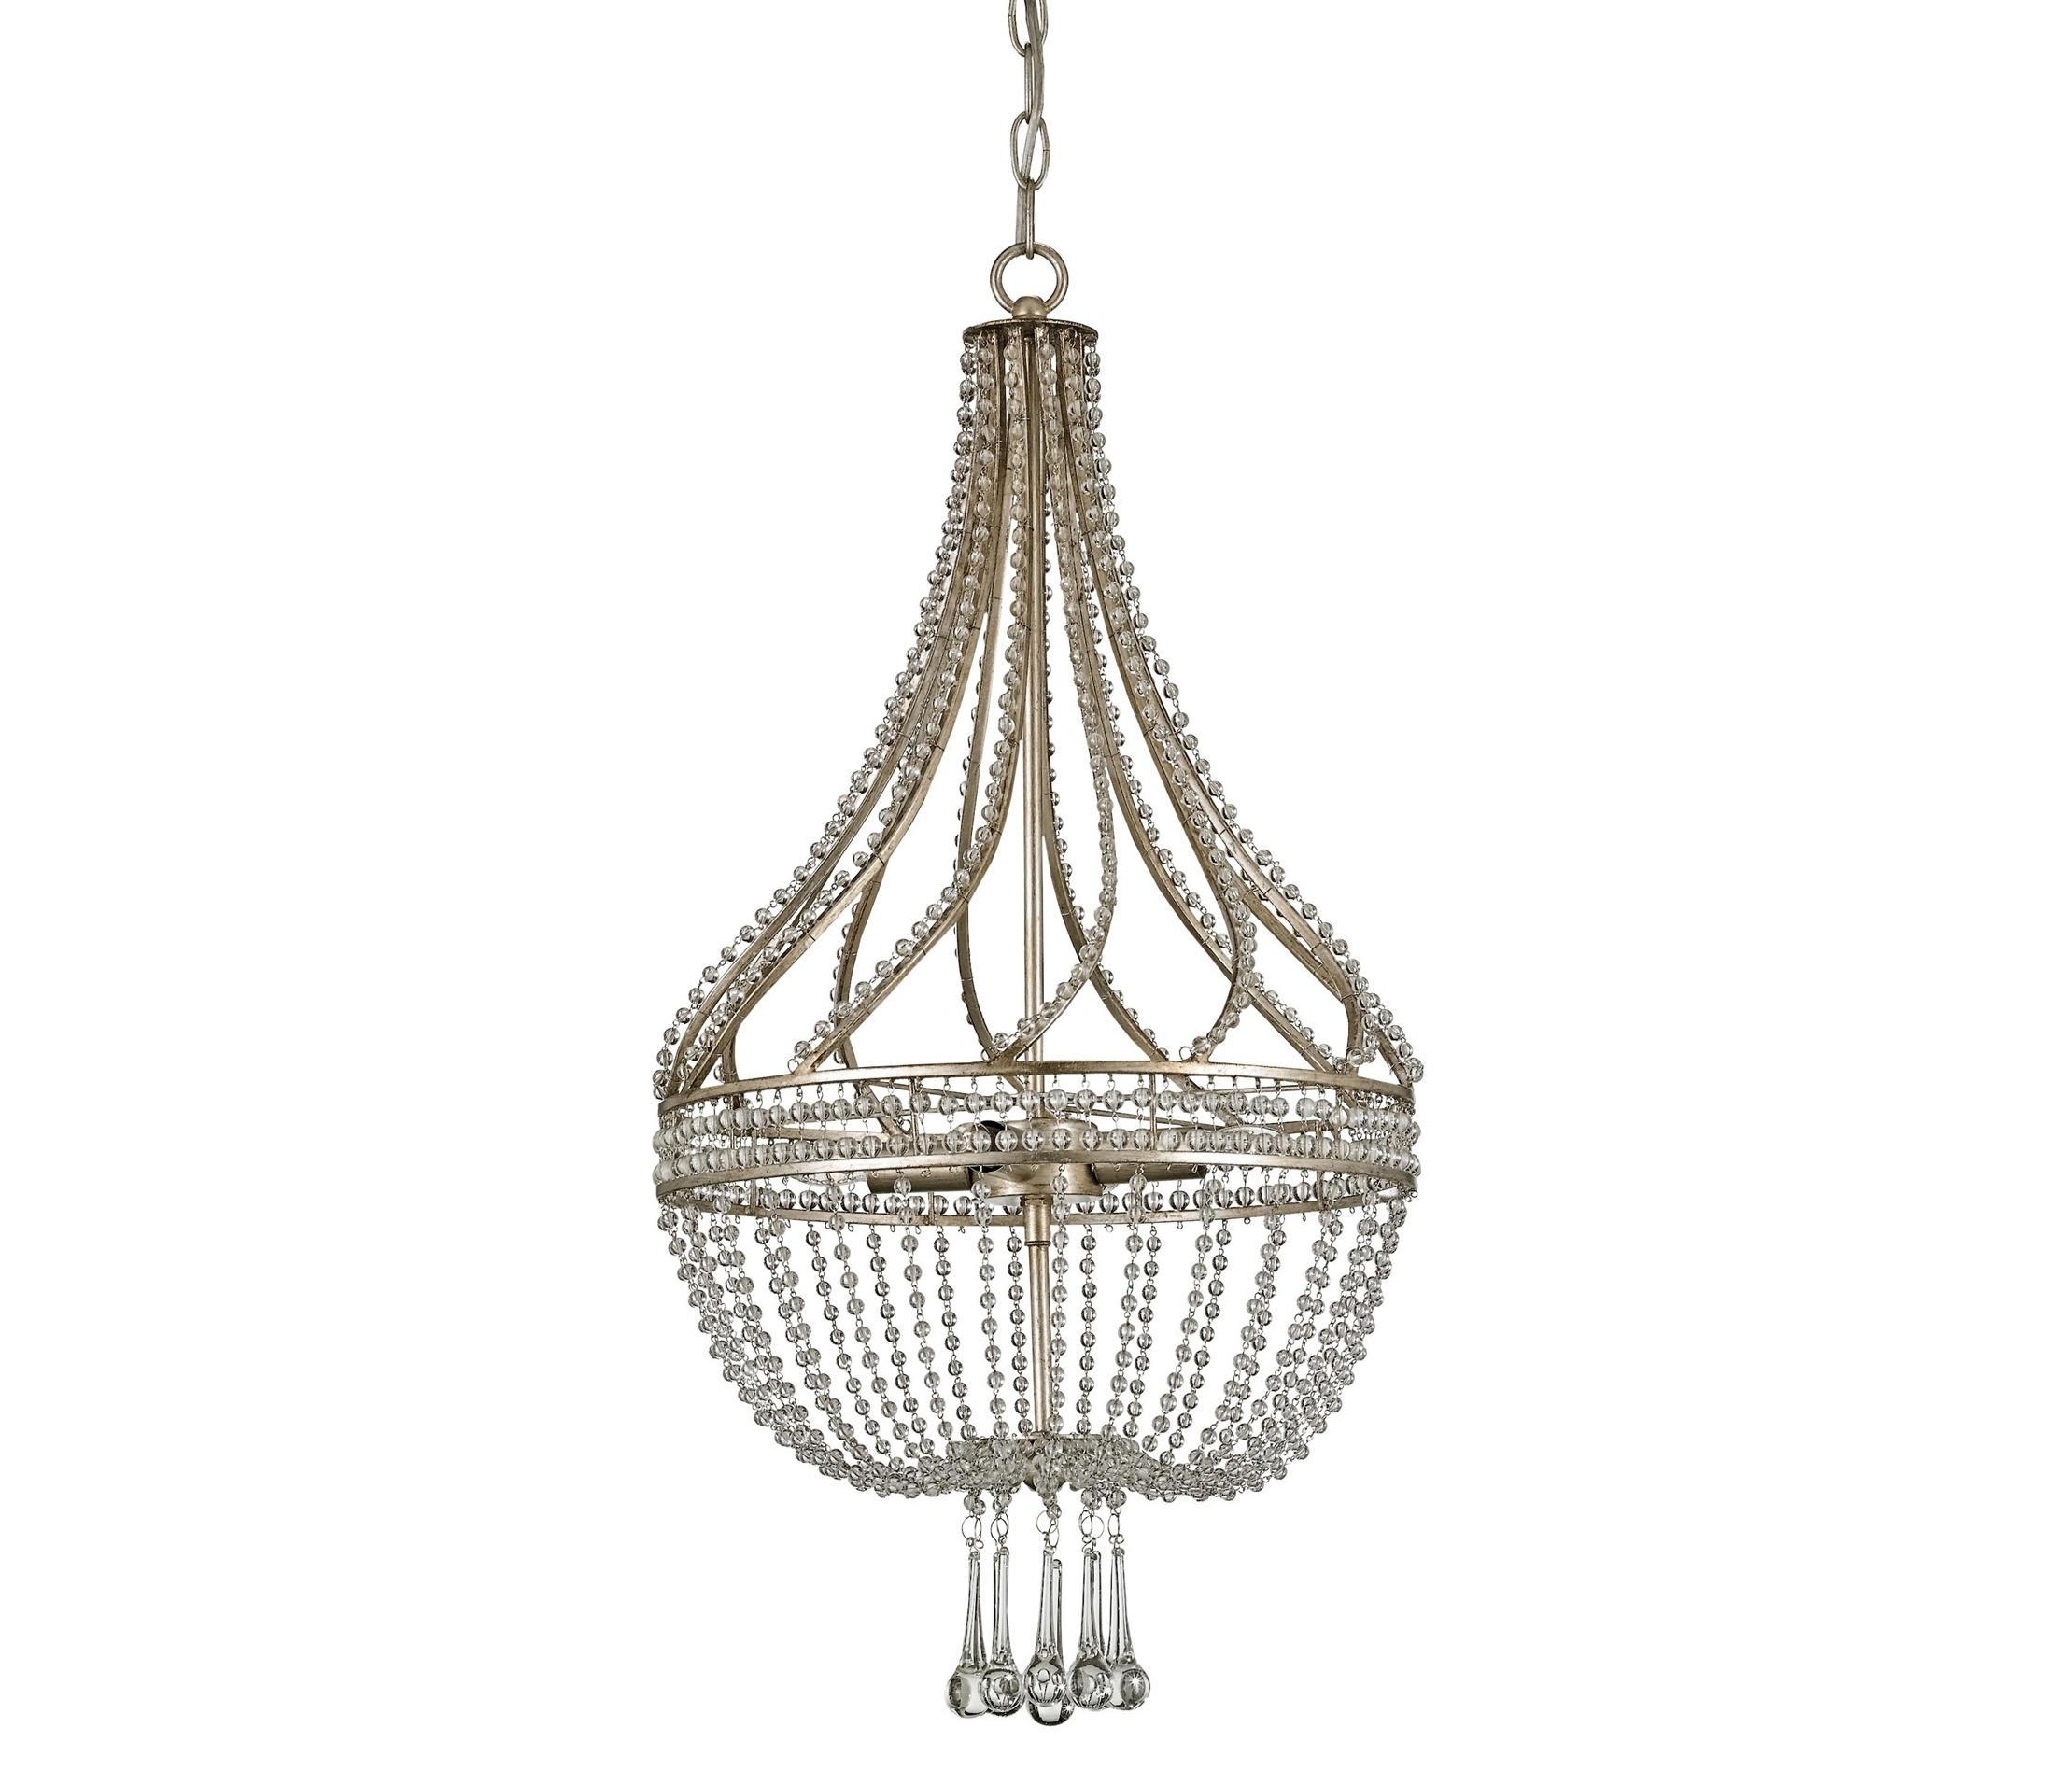 Ingenue chandelier general lighting from currey company ingenue chandelier by currey company general lighting aloadofball Image collections